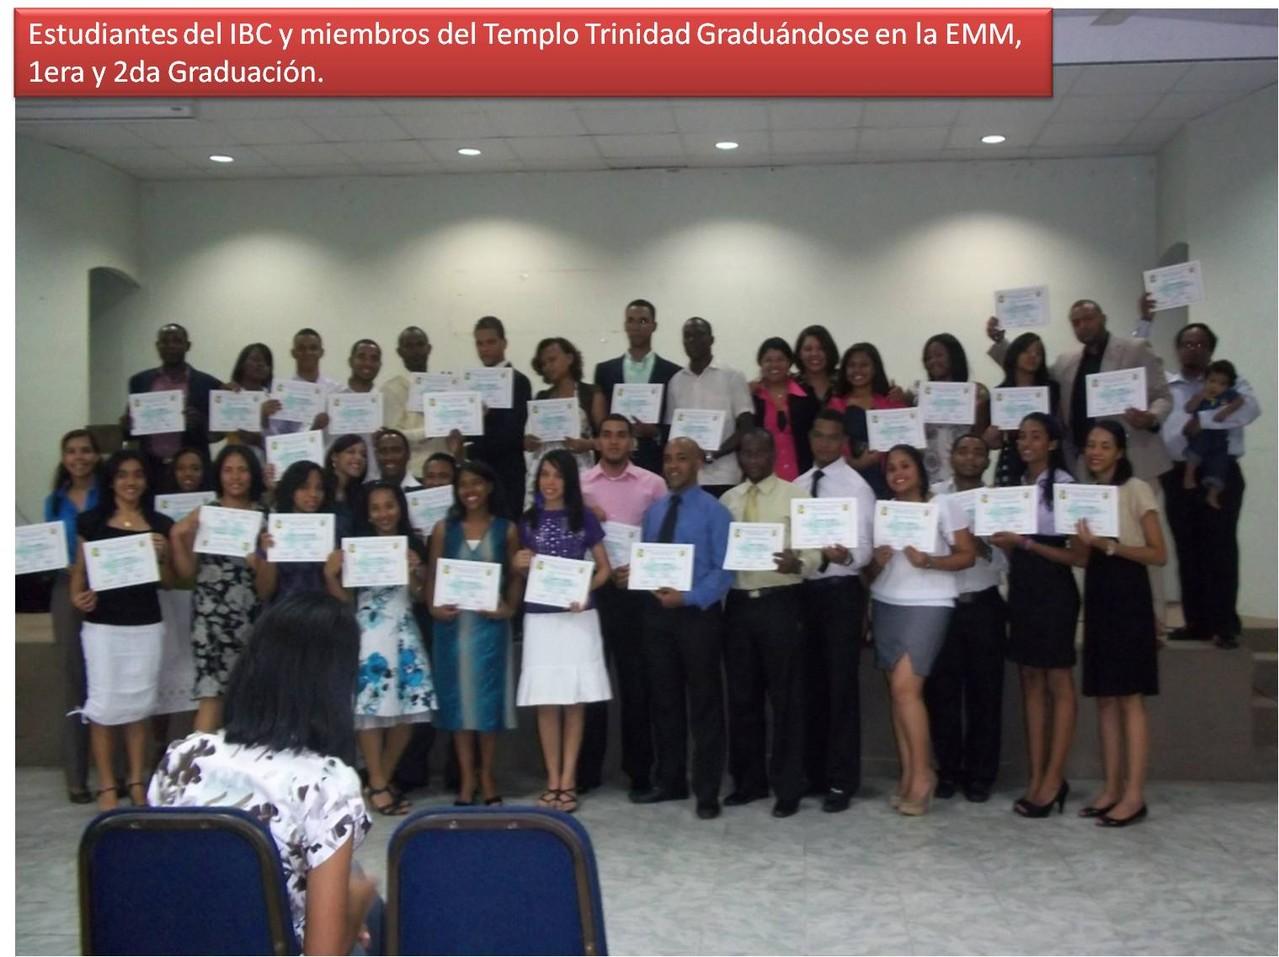 2 Graduaciones IBC e Iglesia Trinidad